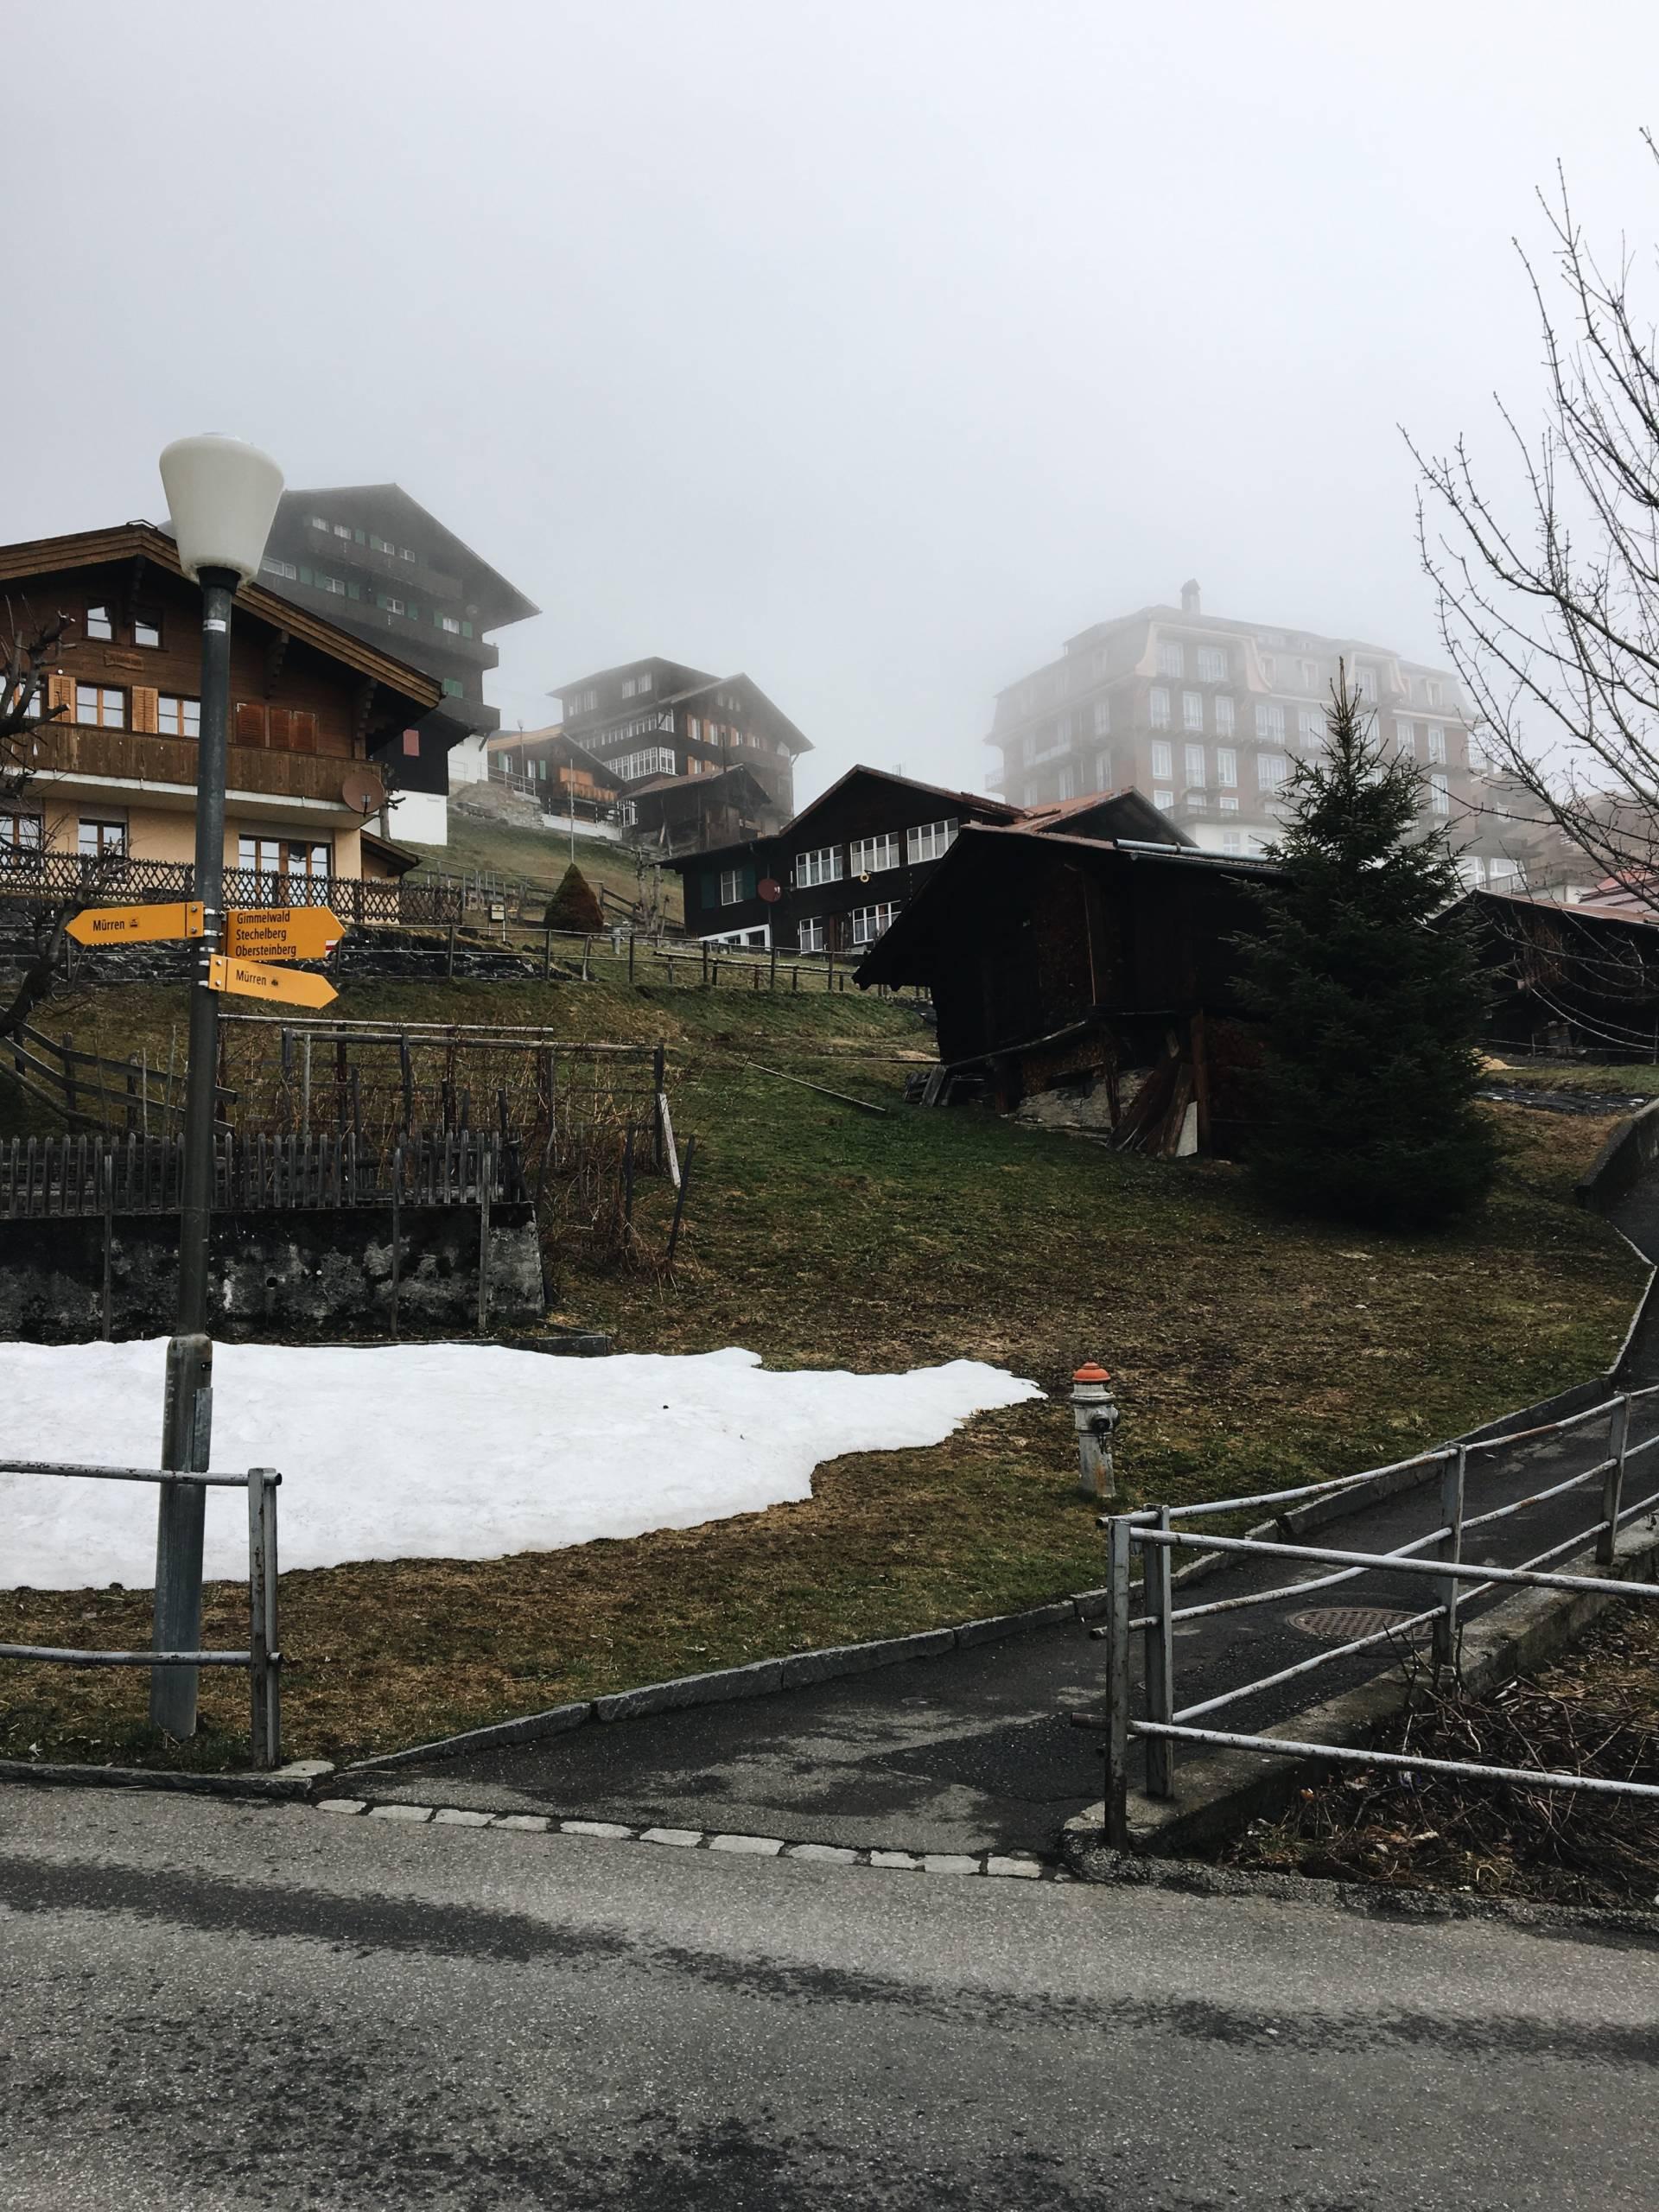 Spring in Gimmelwald Switzerland